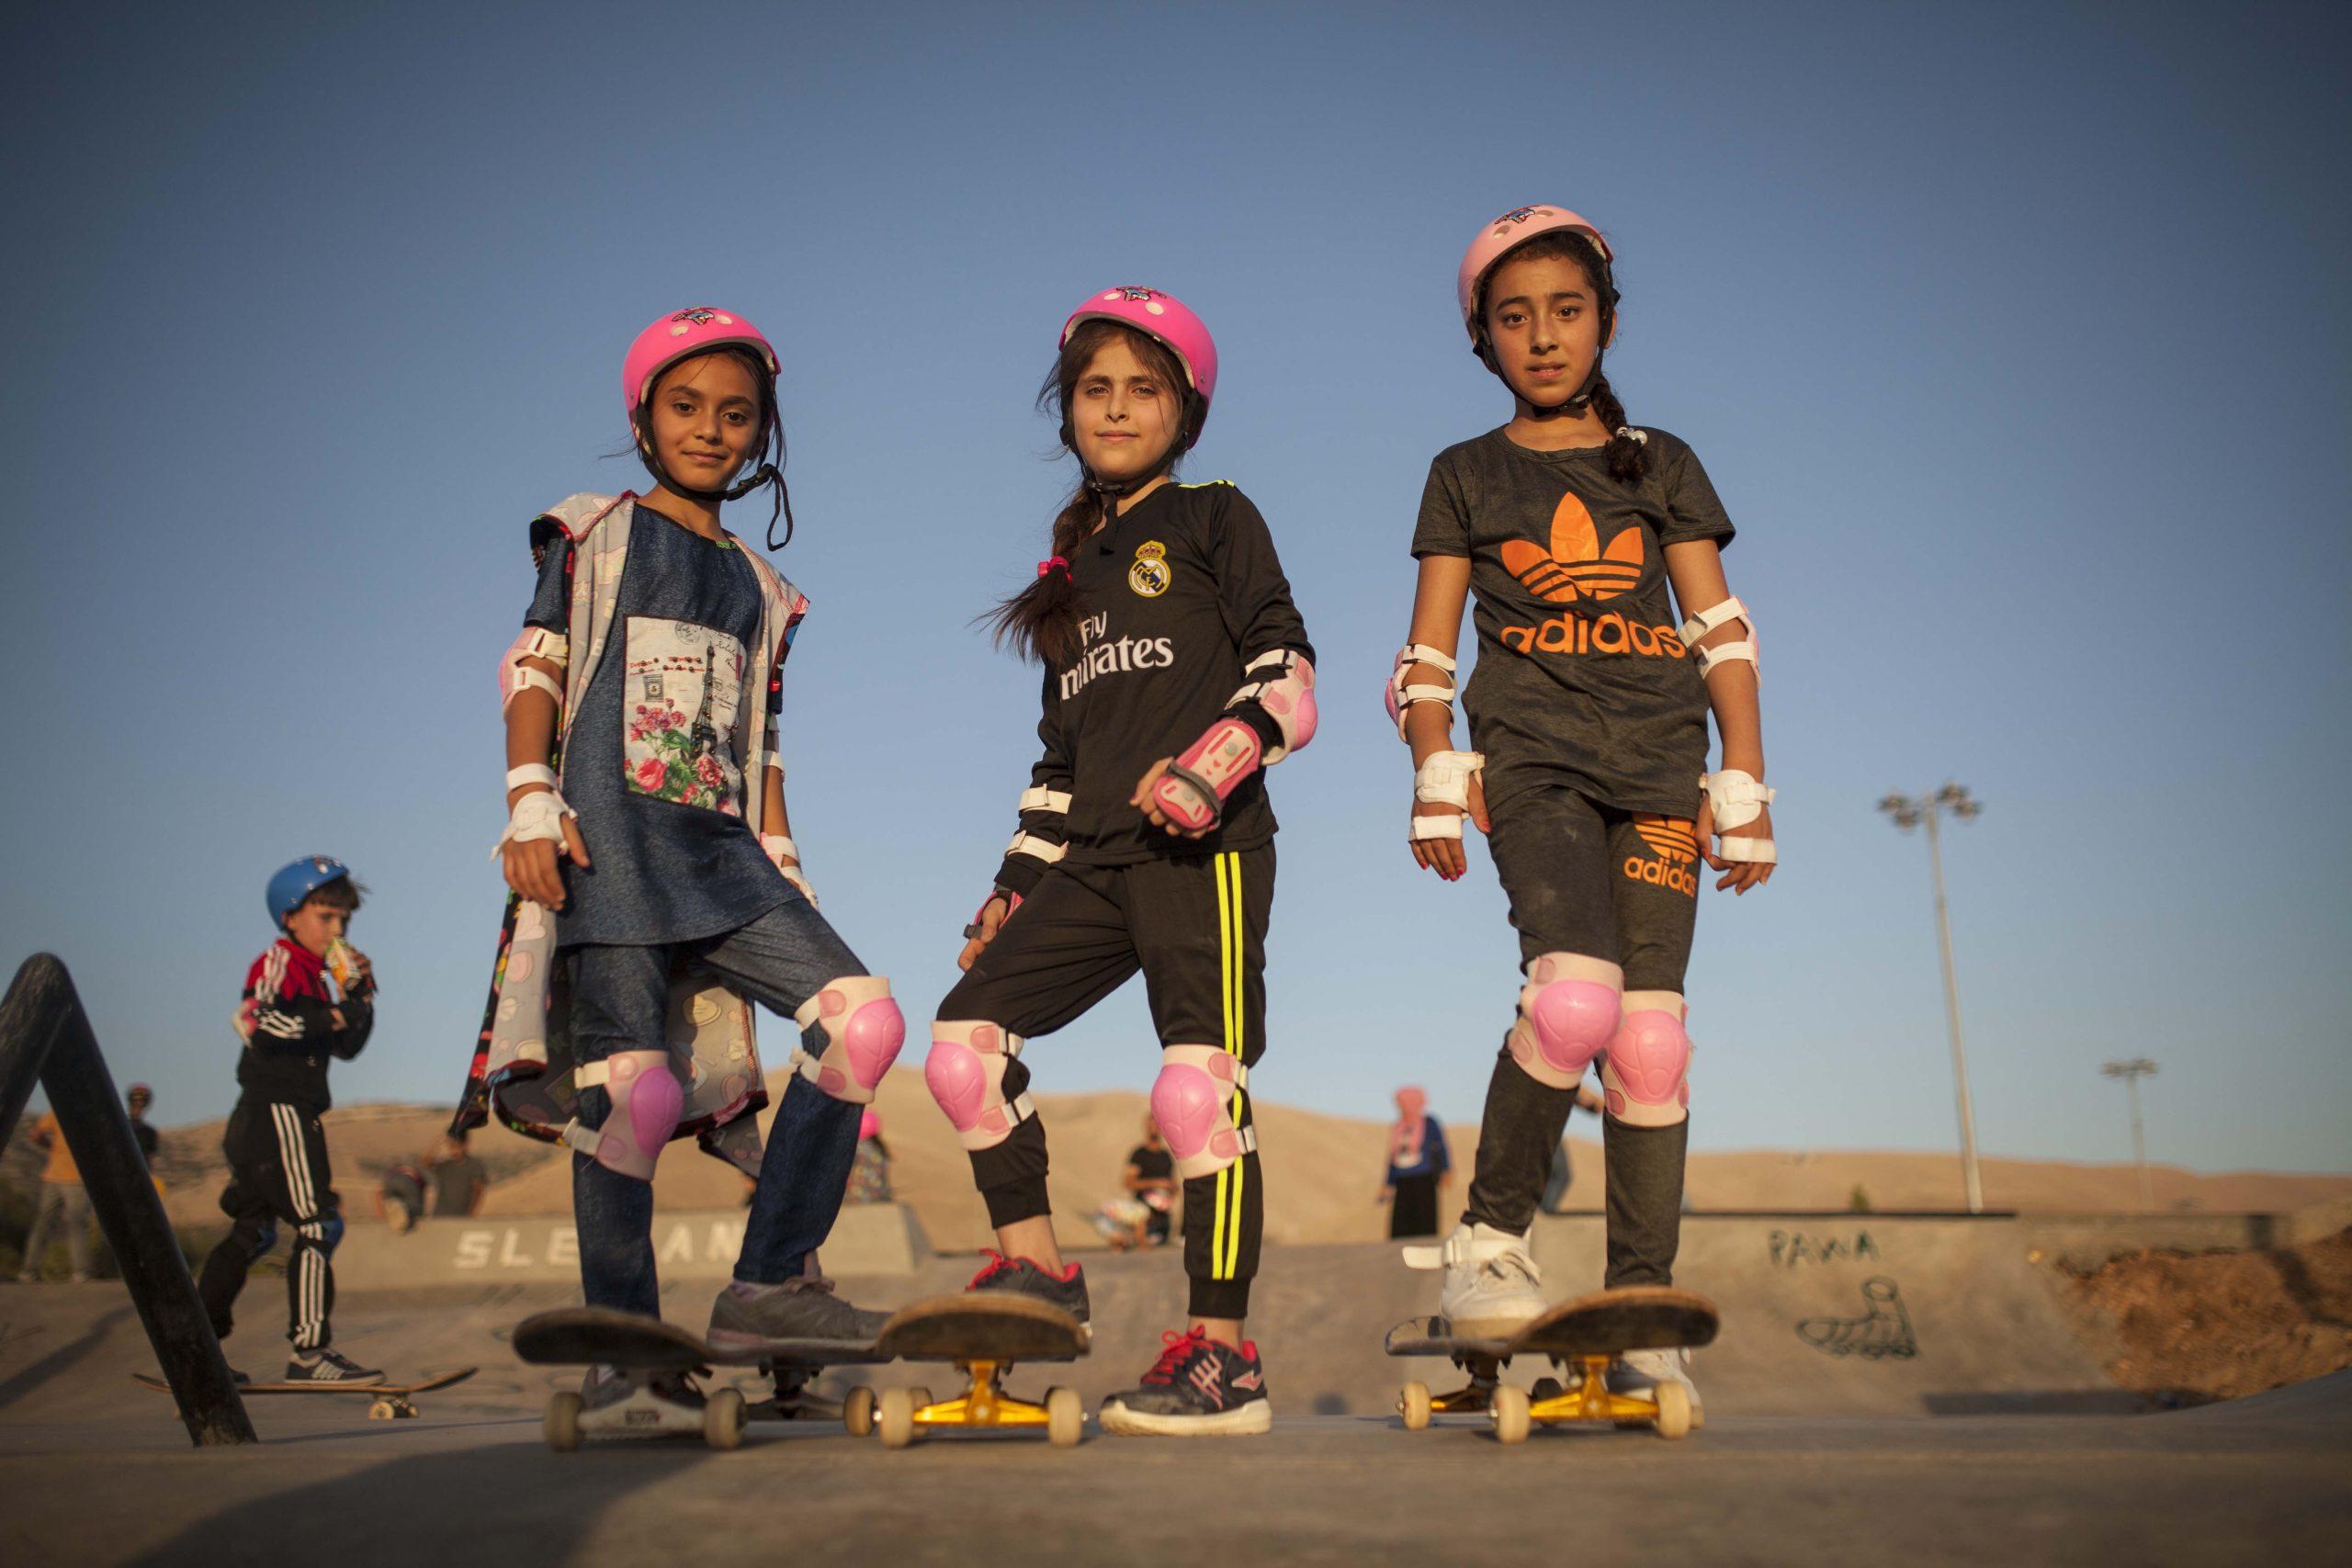 Happy Monday – Make Life Skate Life in Iraq